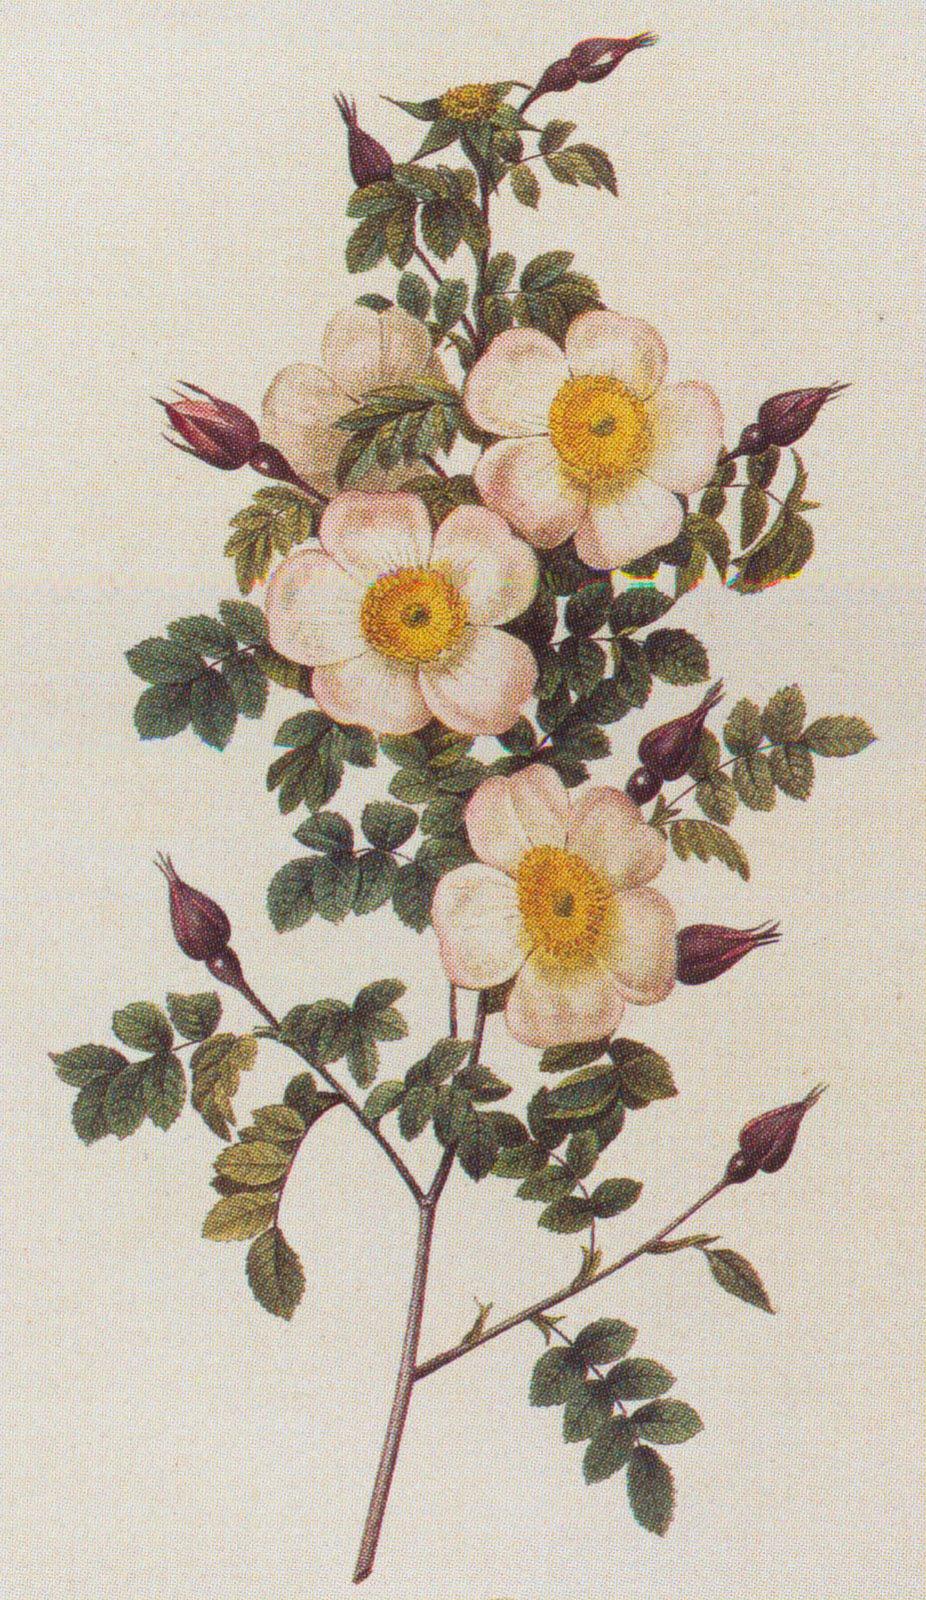 inkspired musings: The North Dakota Wild Prairie Rose926 x 1600 jpeg 383kB